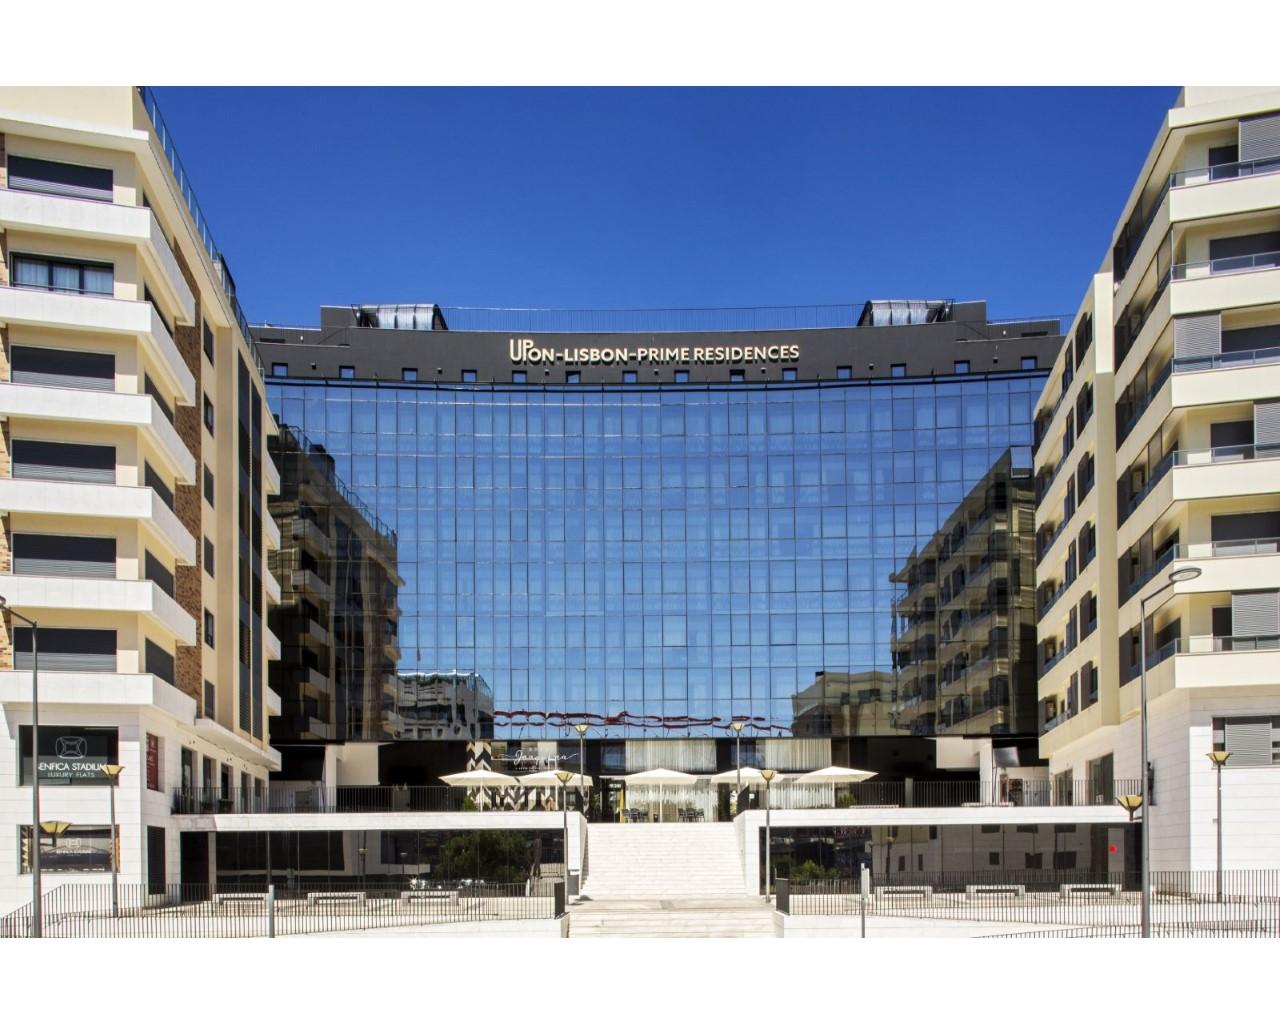 Upon Lisbon Prime Residences